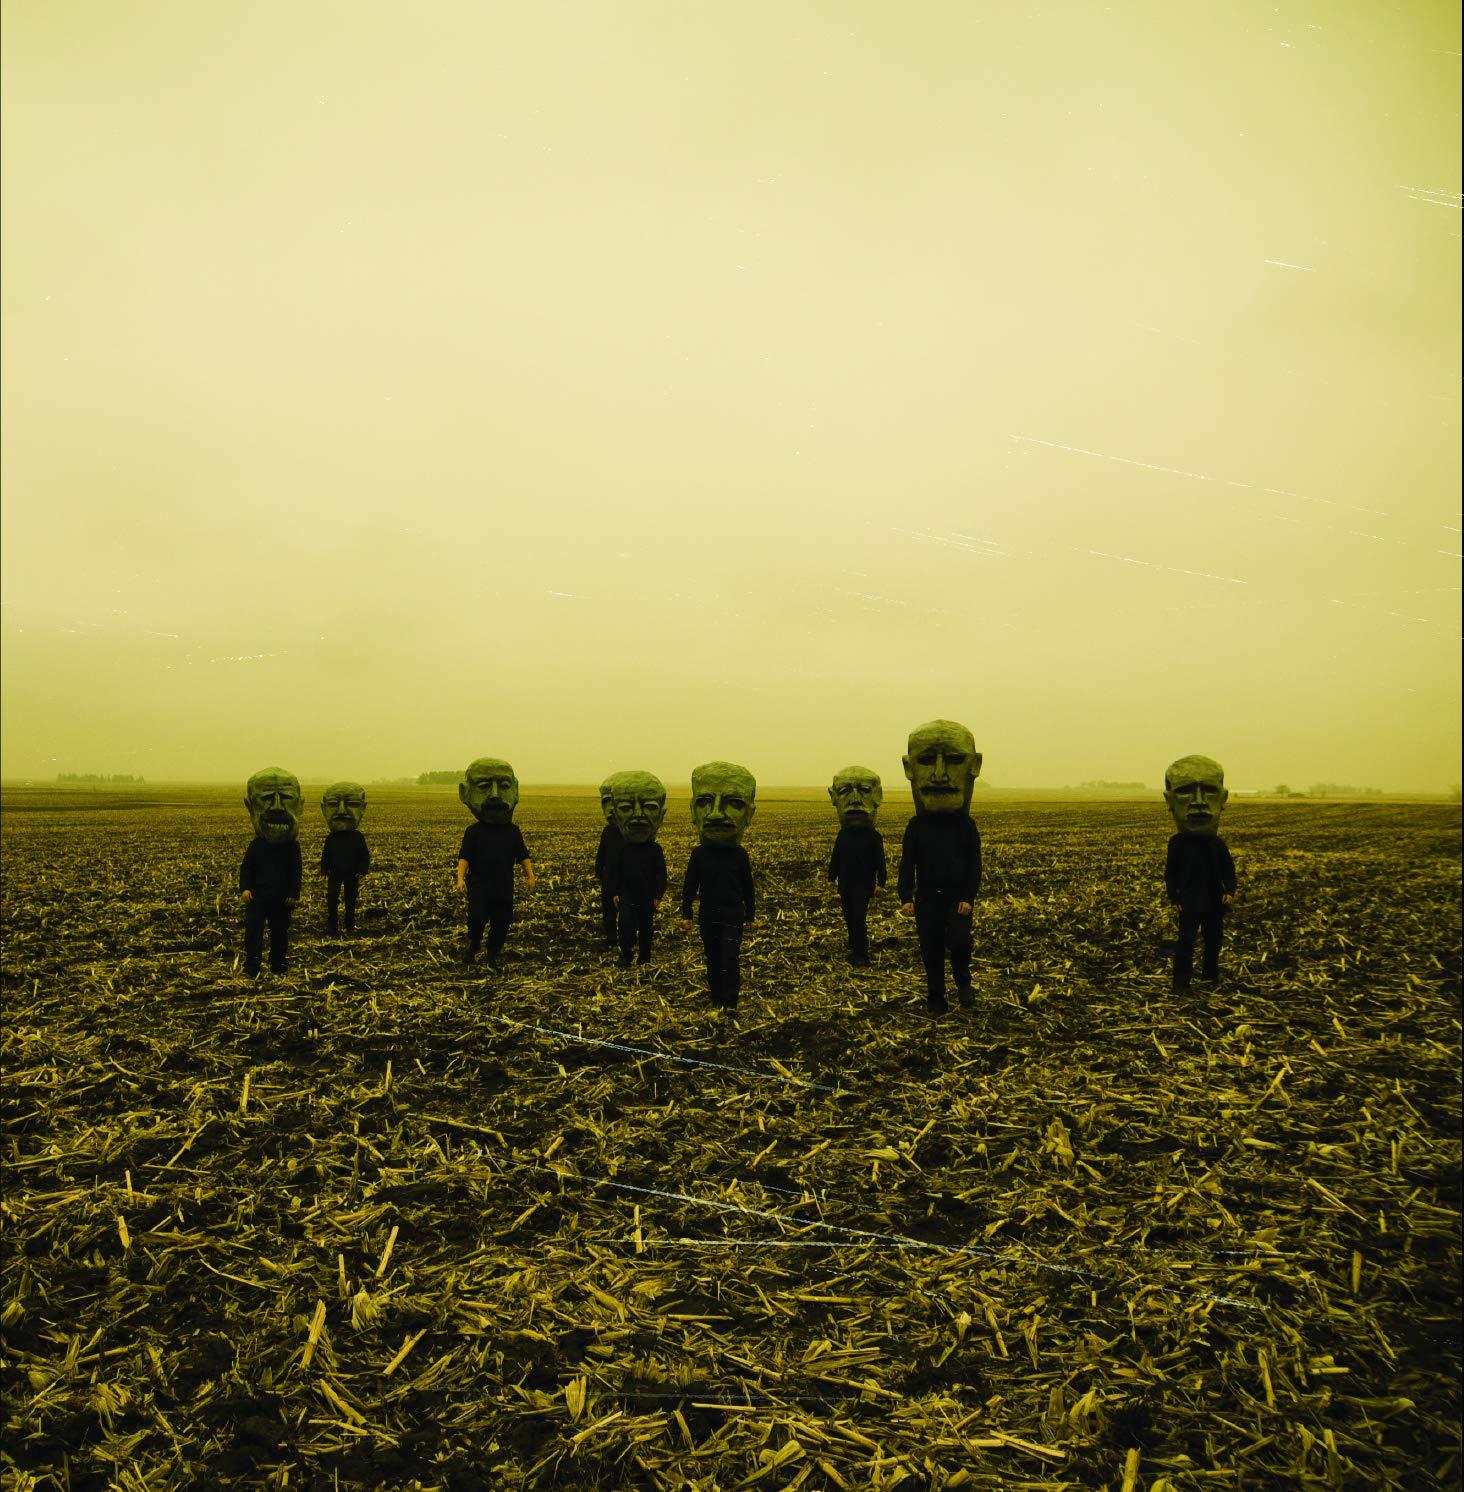 Slipknot - All Hope Is Gone 10Th Anniversary Metallic Silver